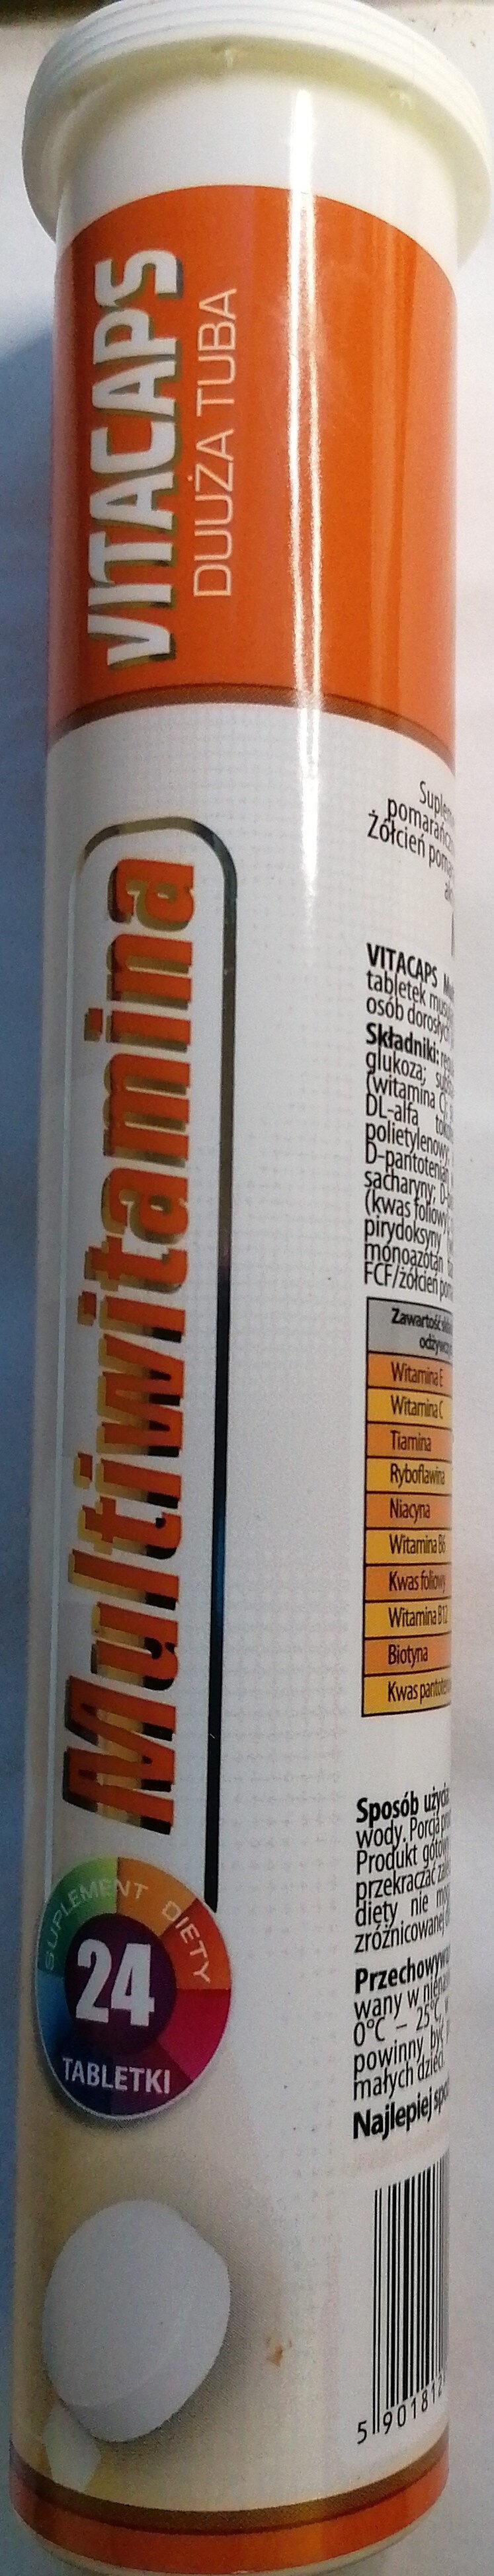 Vitacaps Multivitamina - Produit